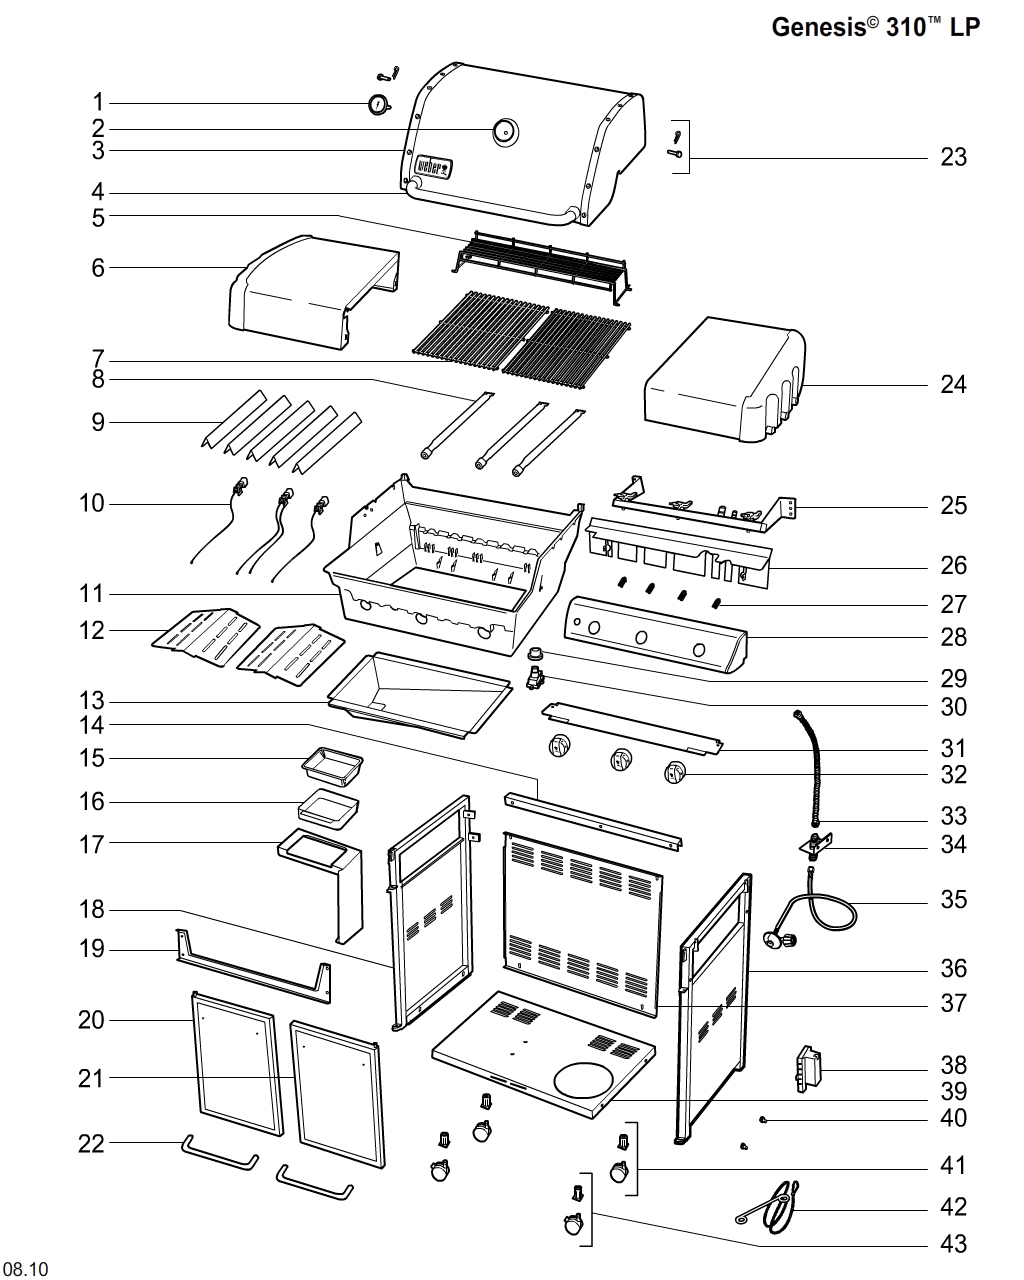 Schematic Image 6550001